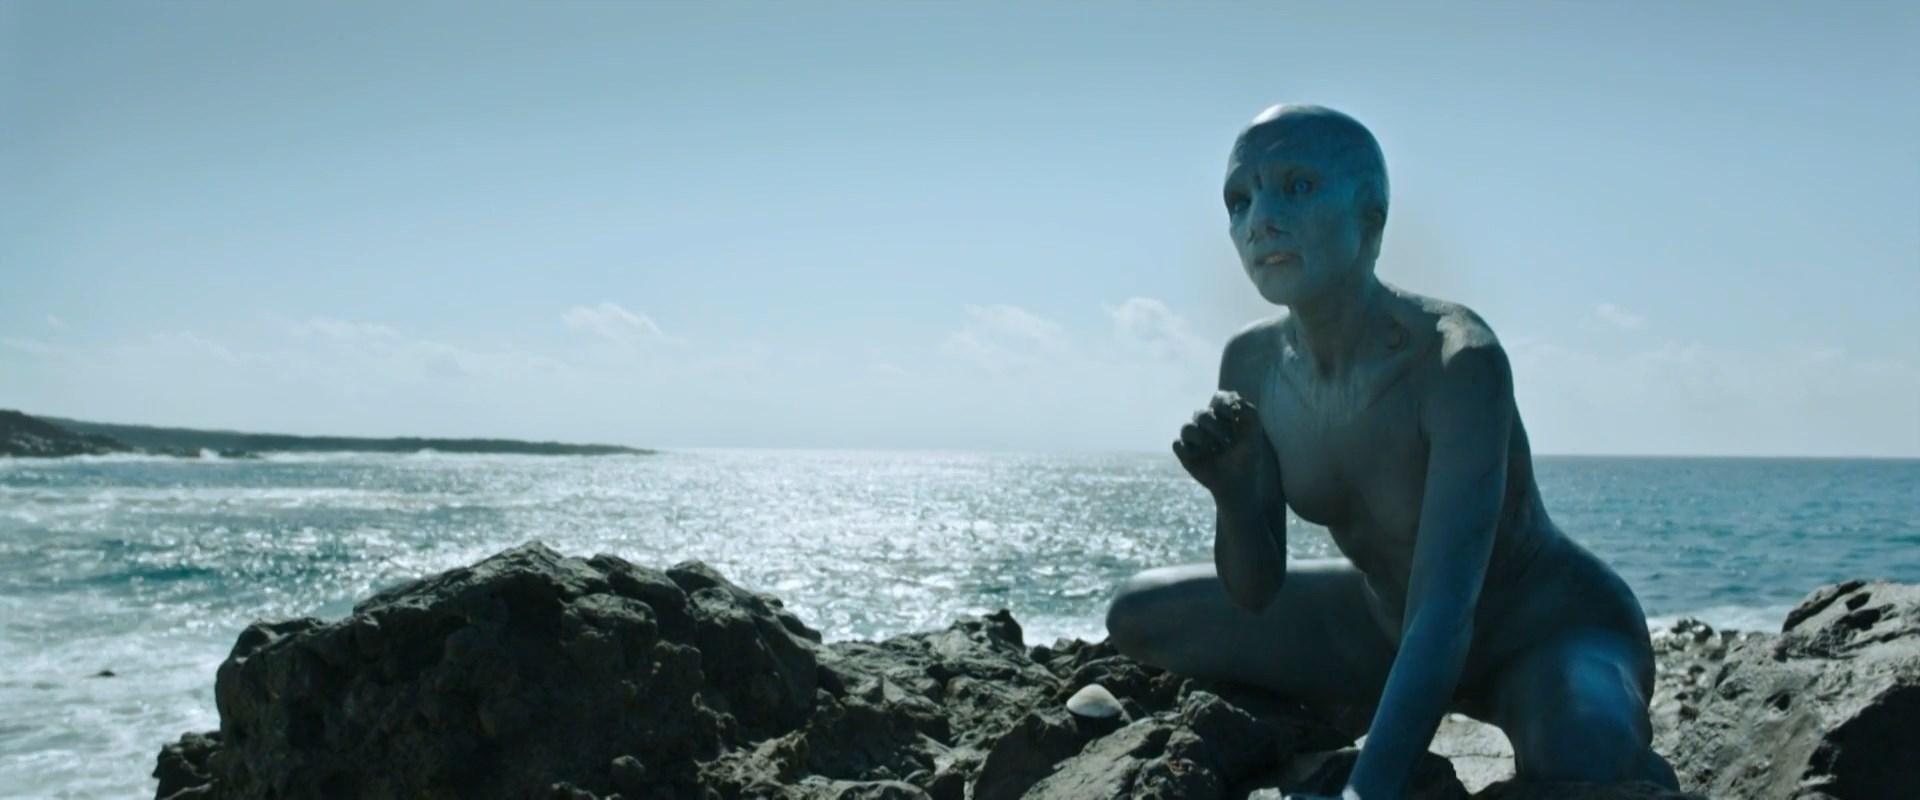 Aura Garrido Nude nude video celebs » aura garrido nude - cold skin (2017)